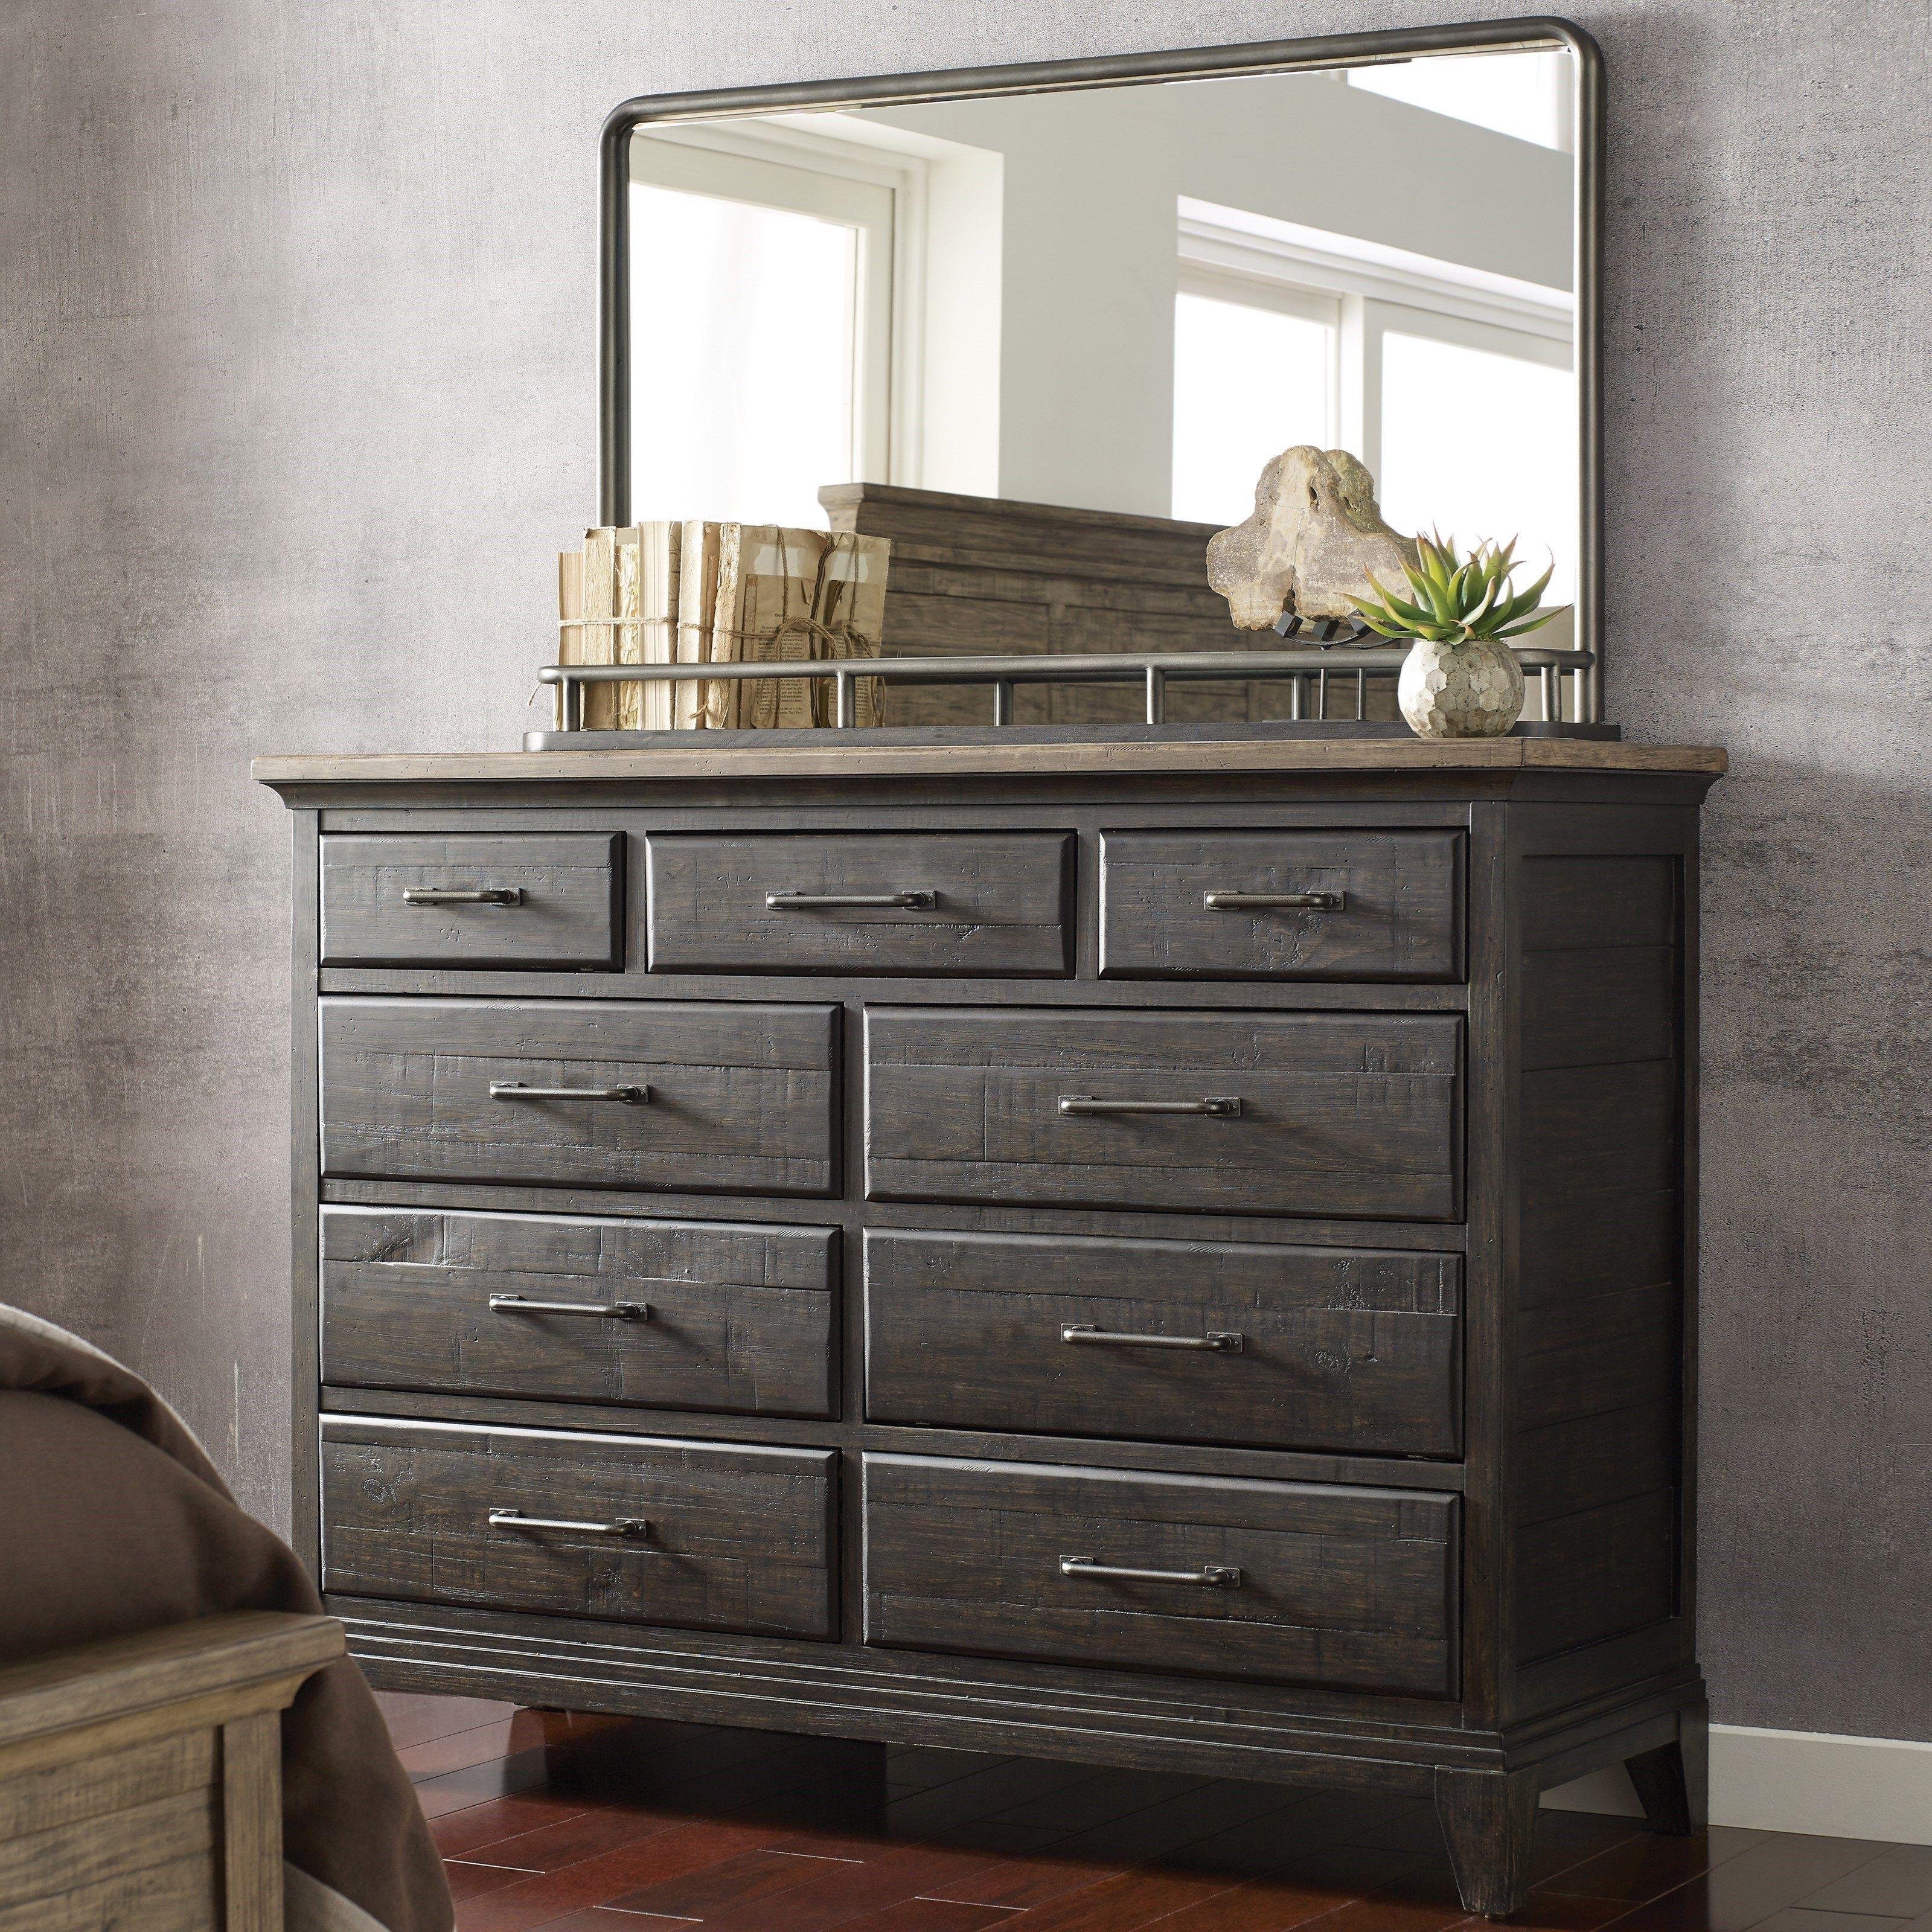 Plank Road Westwood Bureau and Mirror Set by Kincaid Furniture